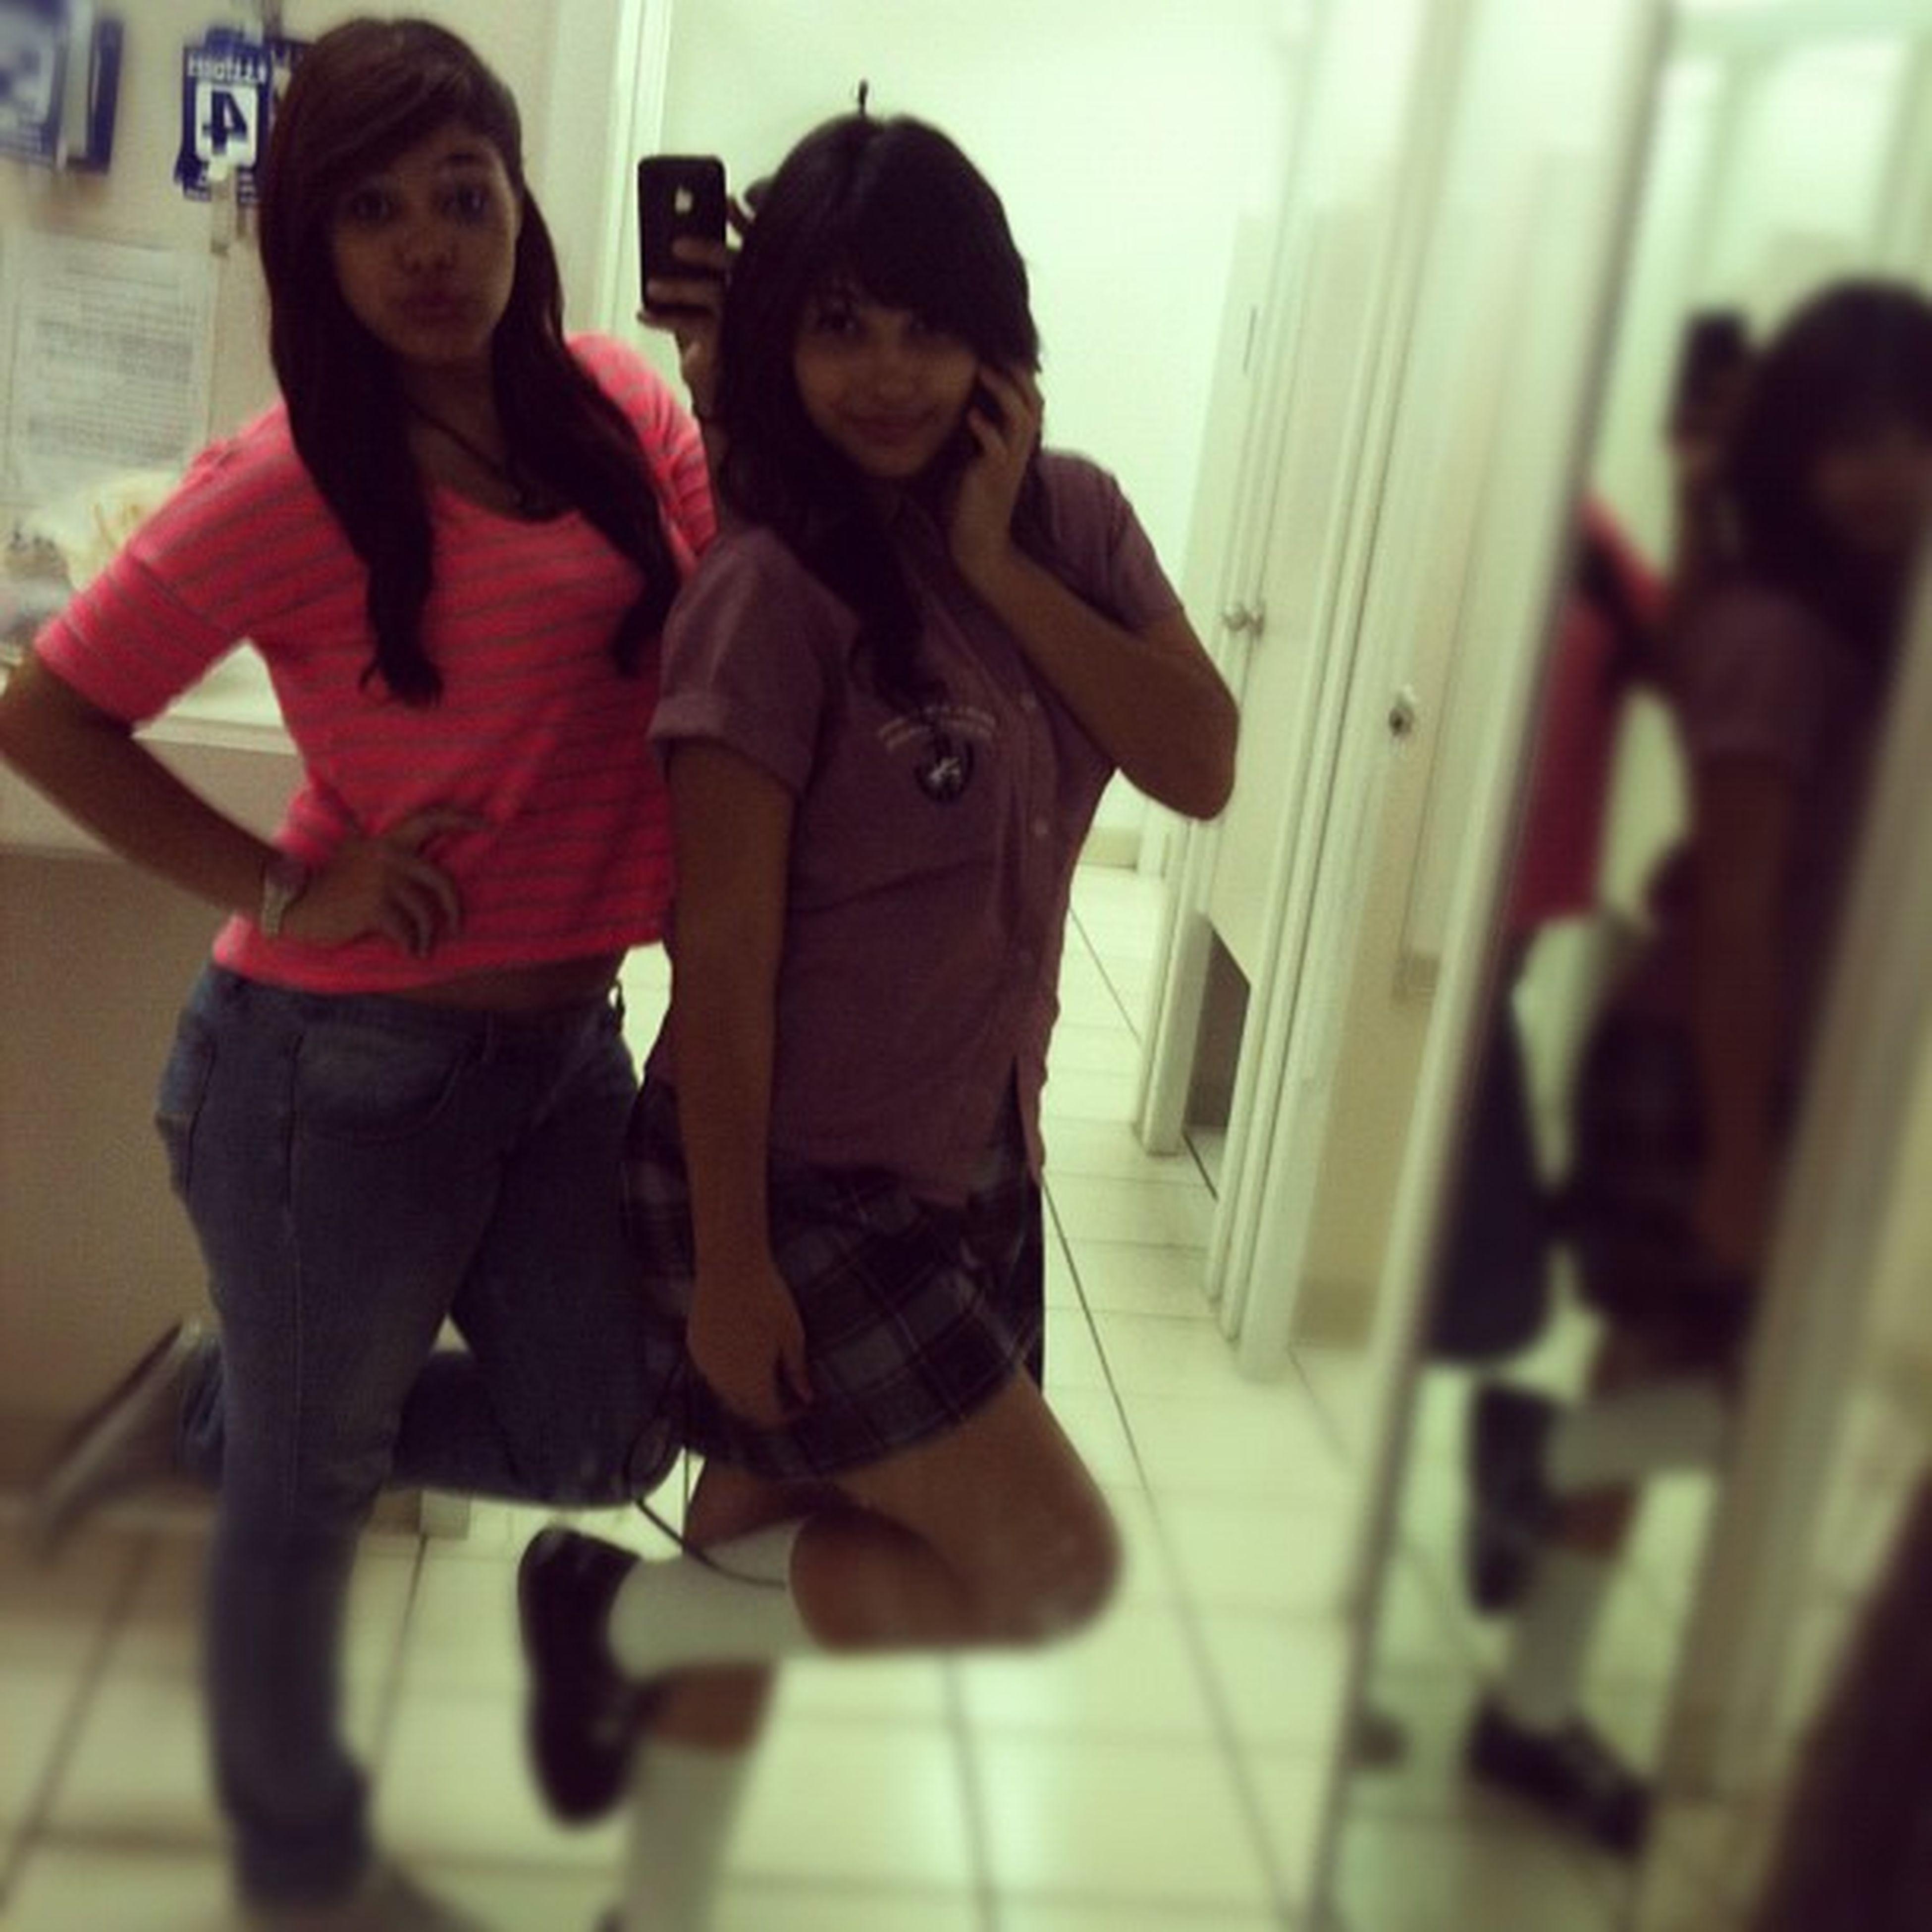 con @danielasuhey21 ✌ Follow Cute Us Sisyers shopping fittingroom friday